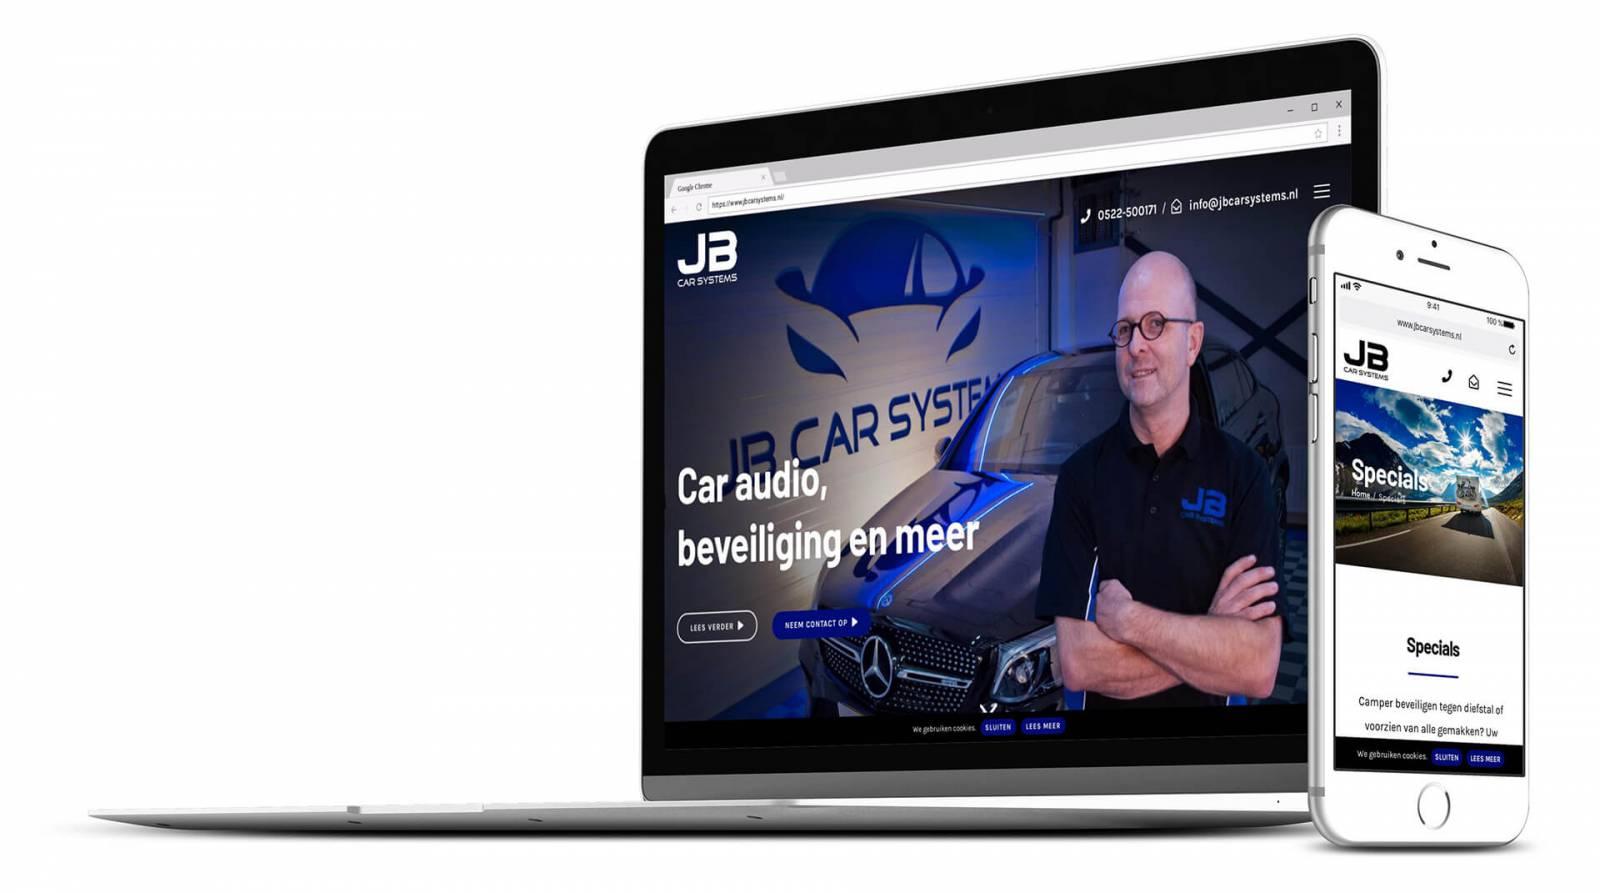 jb car systems website